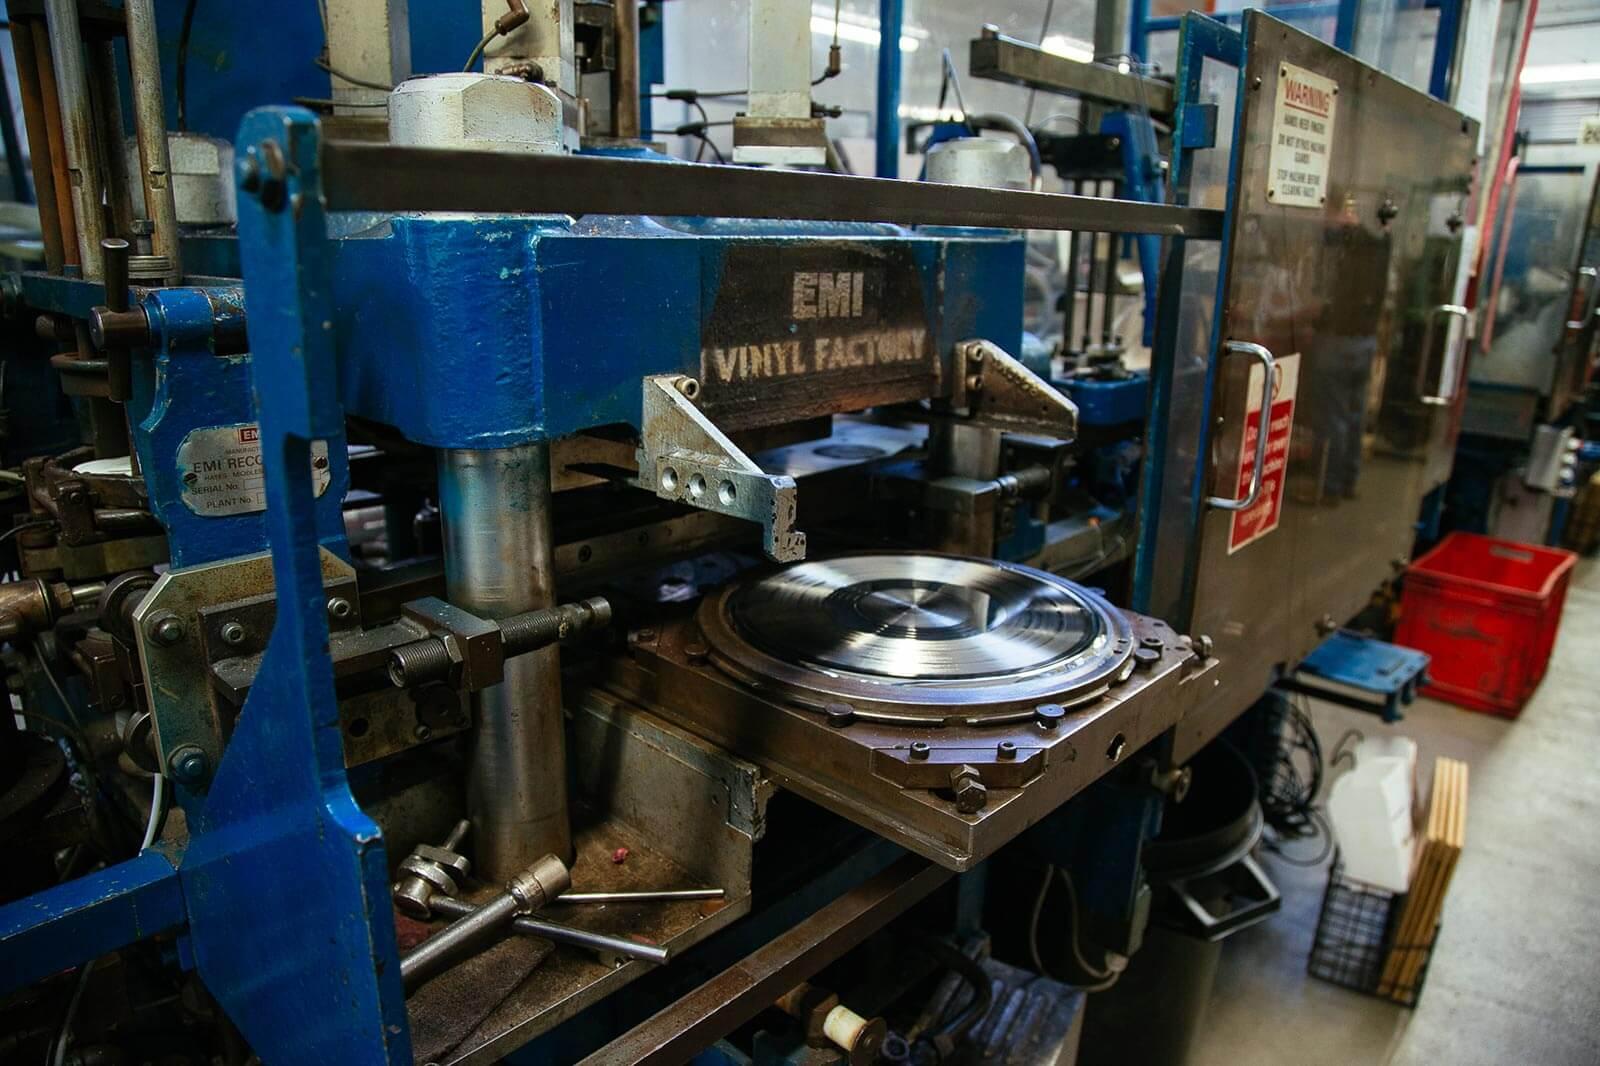 Plant The Vinyl Factory